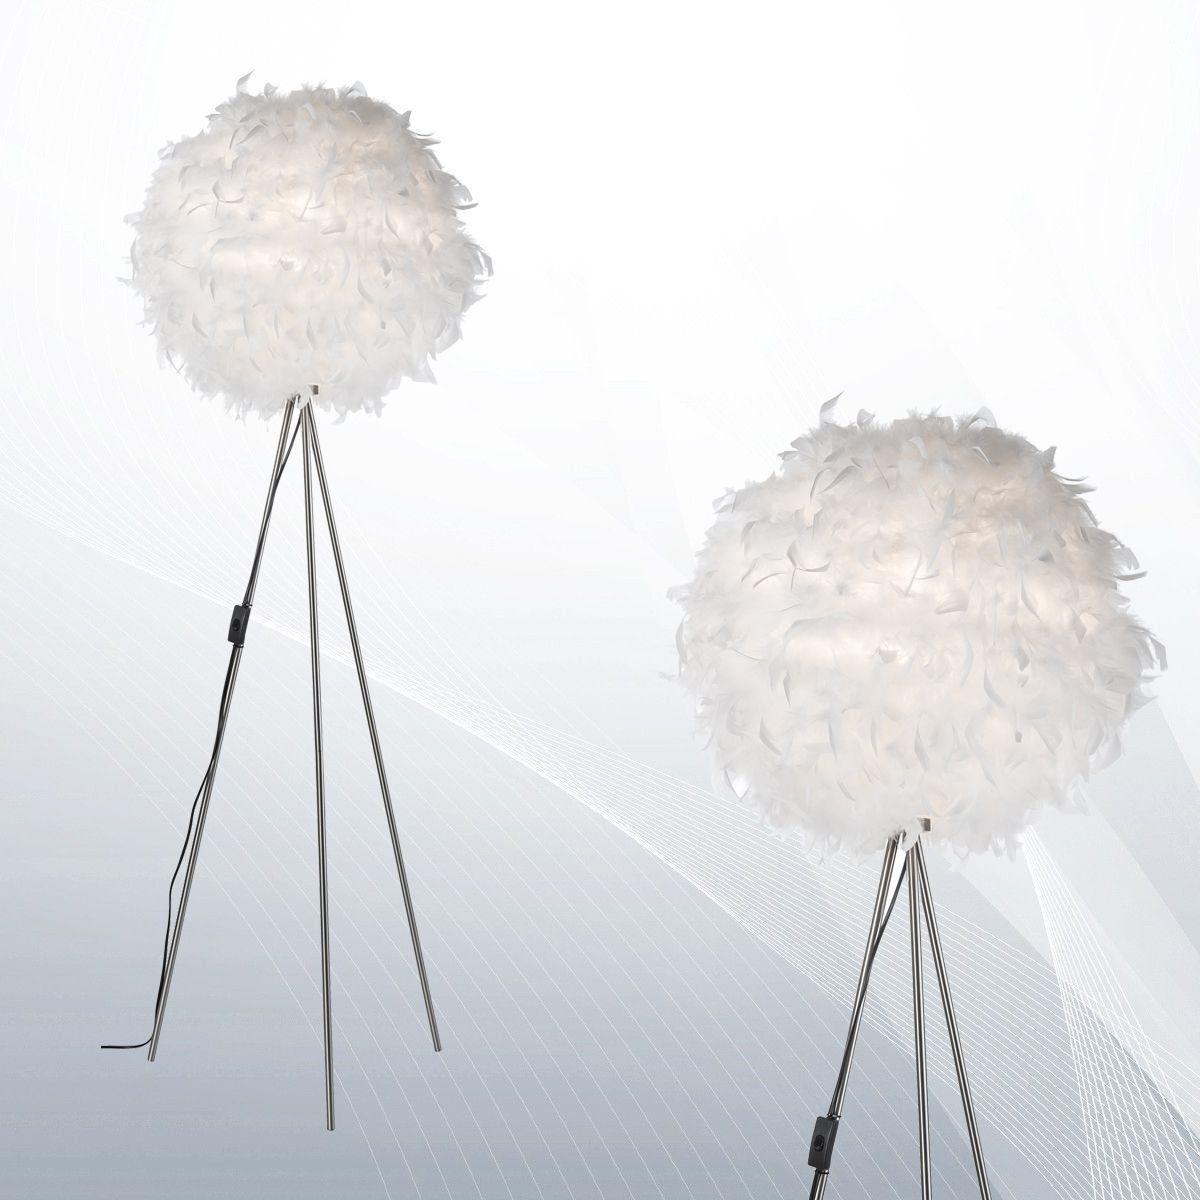 лампион WALLY PT1 argento От МЕТЕОР 3 ЕООД